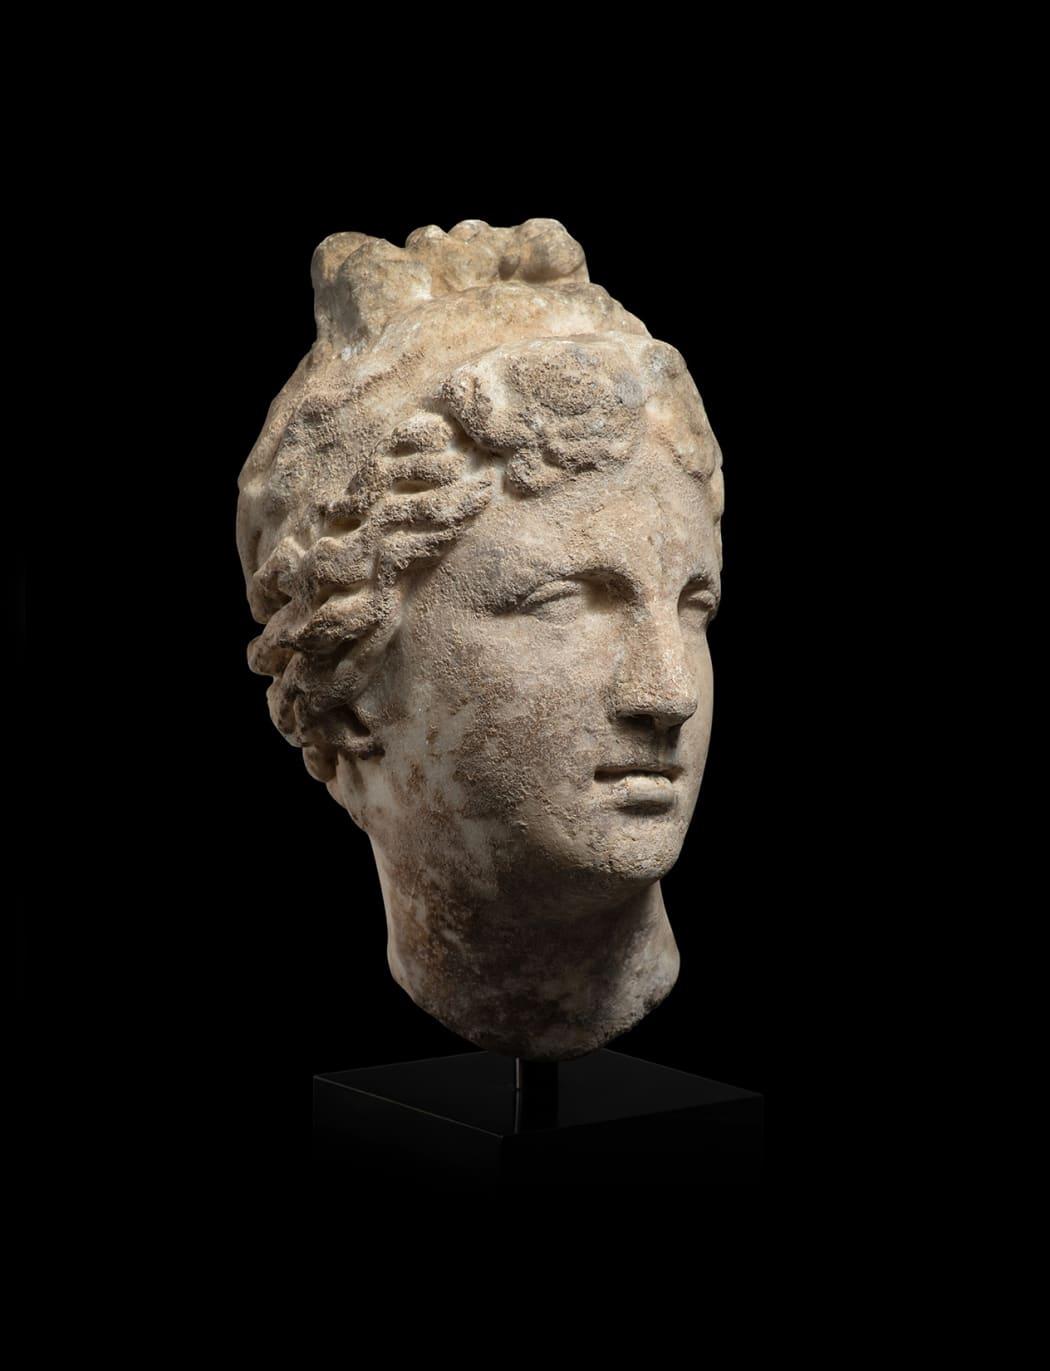 A ROMAN MARBLE HEAD OF VENUS, circa 1st - 2nd century AD